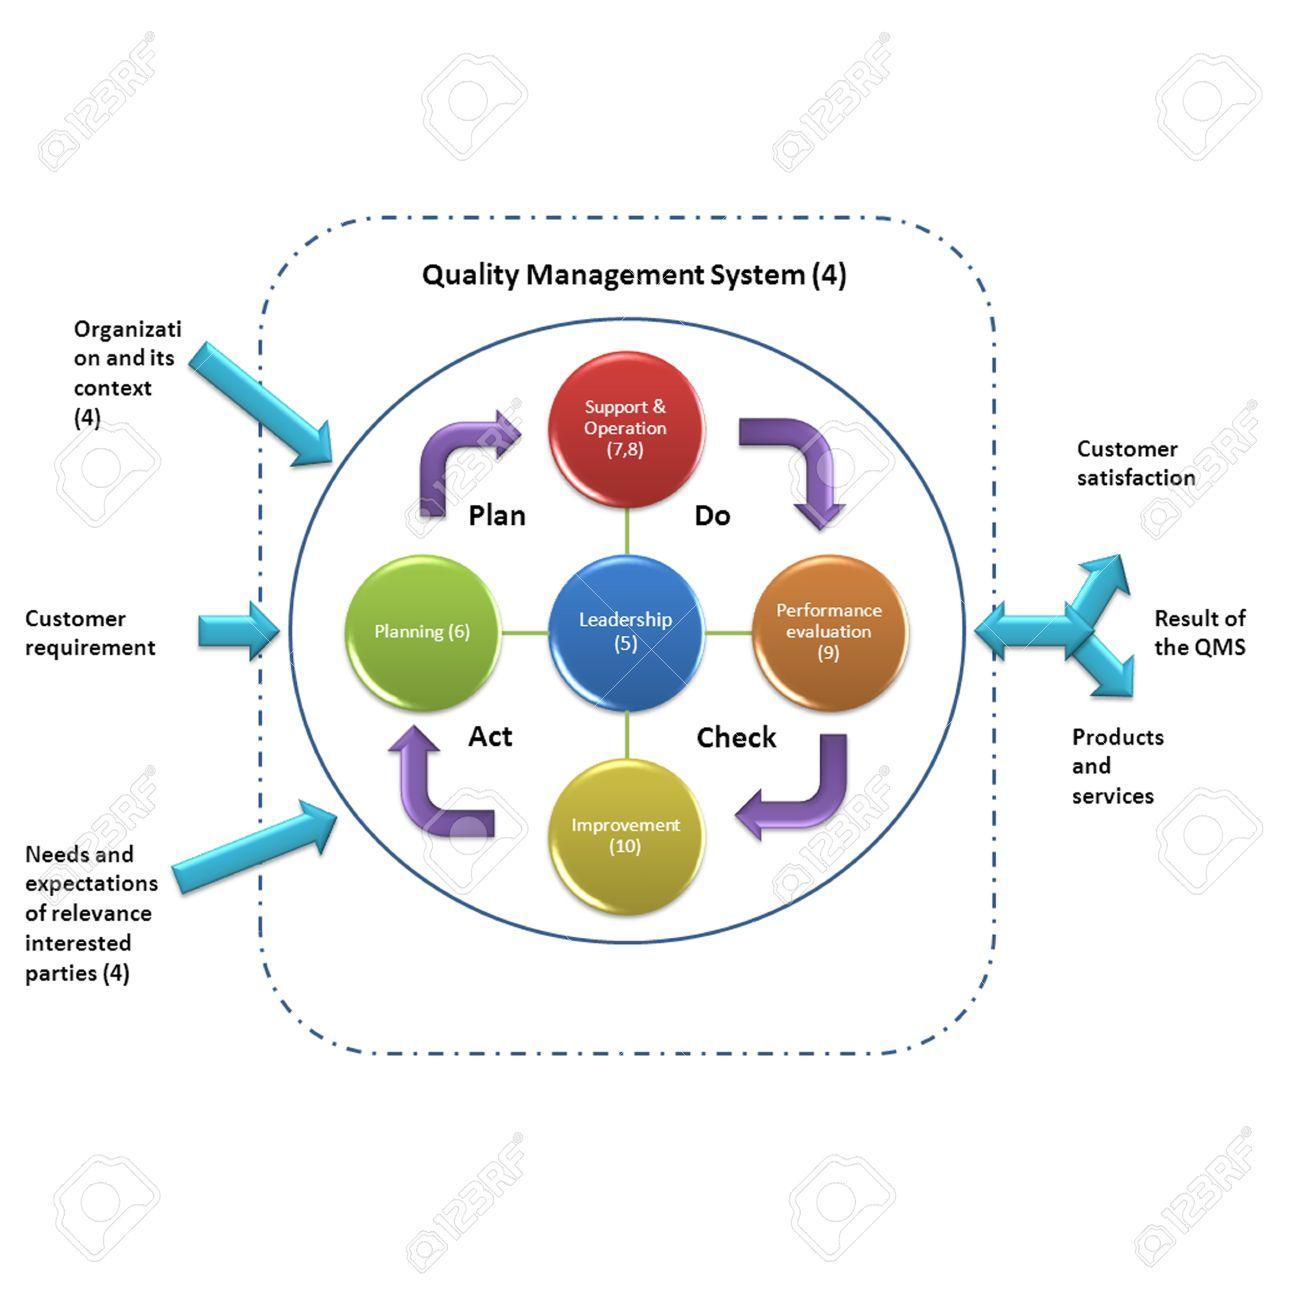 Revised Quality Management System Model Iso 9001 2015 And Iso14001 2015 System Model Environmental Management System Management